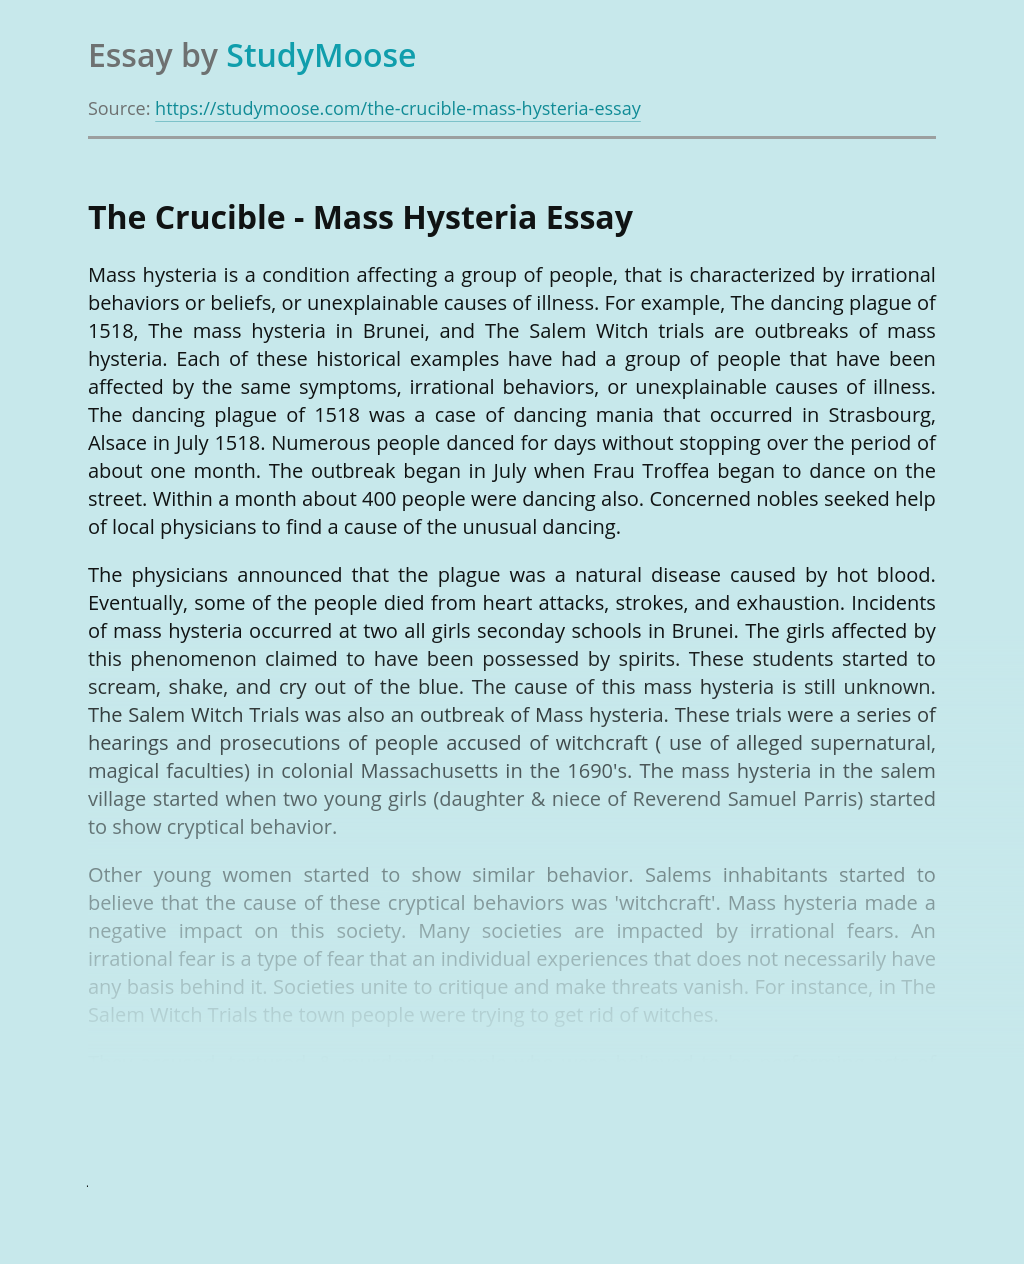 The Crucible - Mass Hysteria